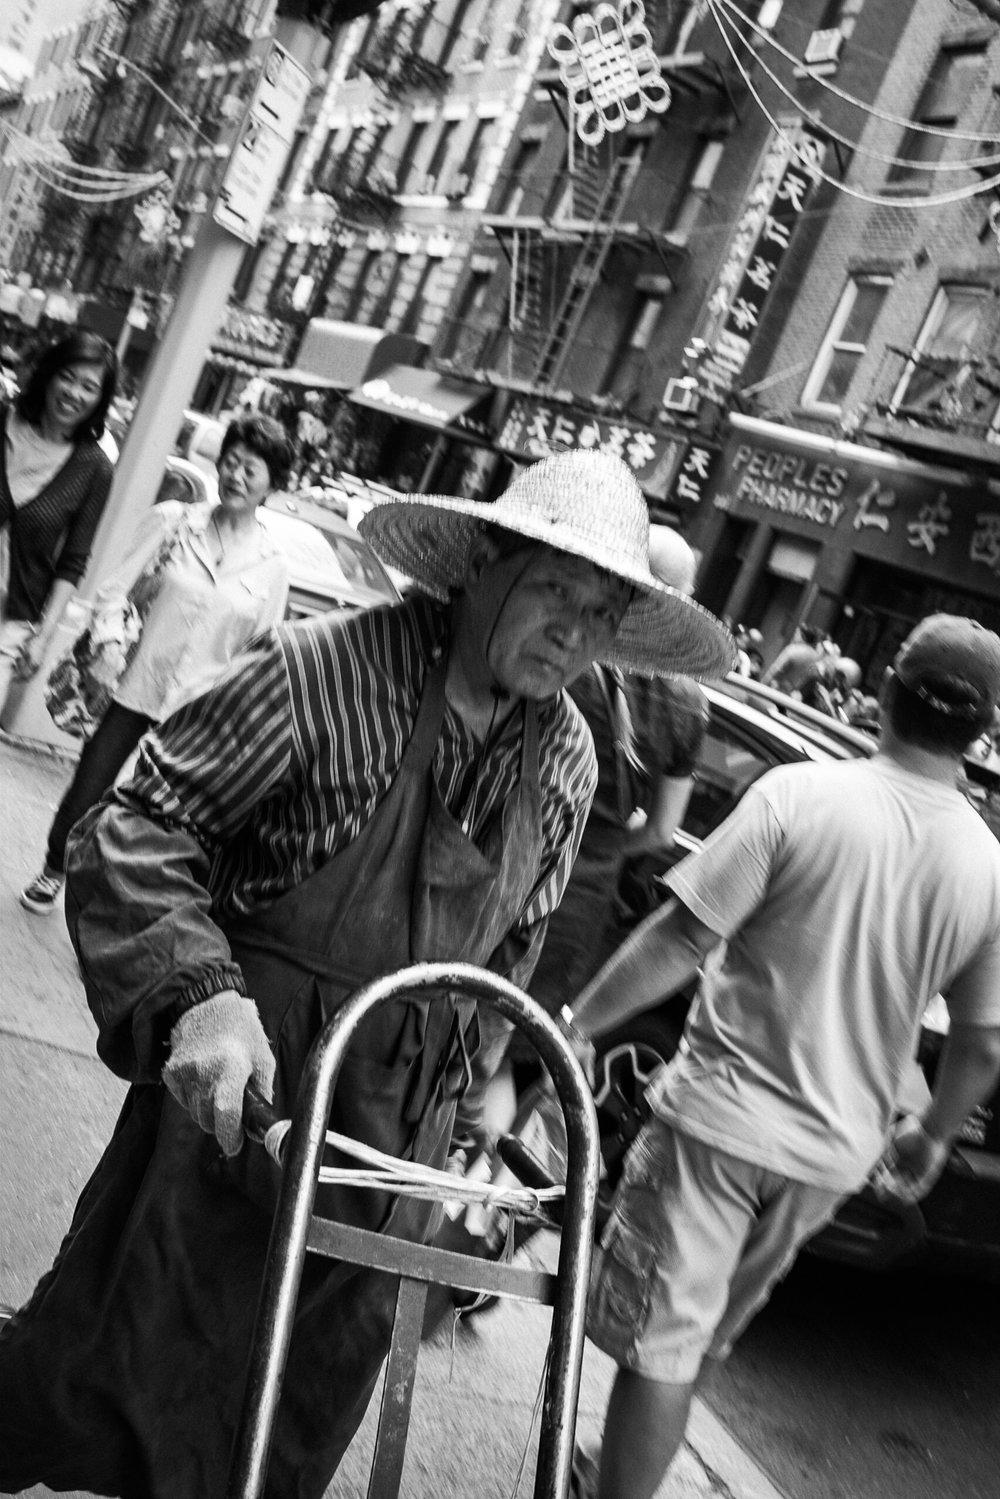 2015-05-14-NYC-1005.jpg